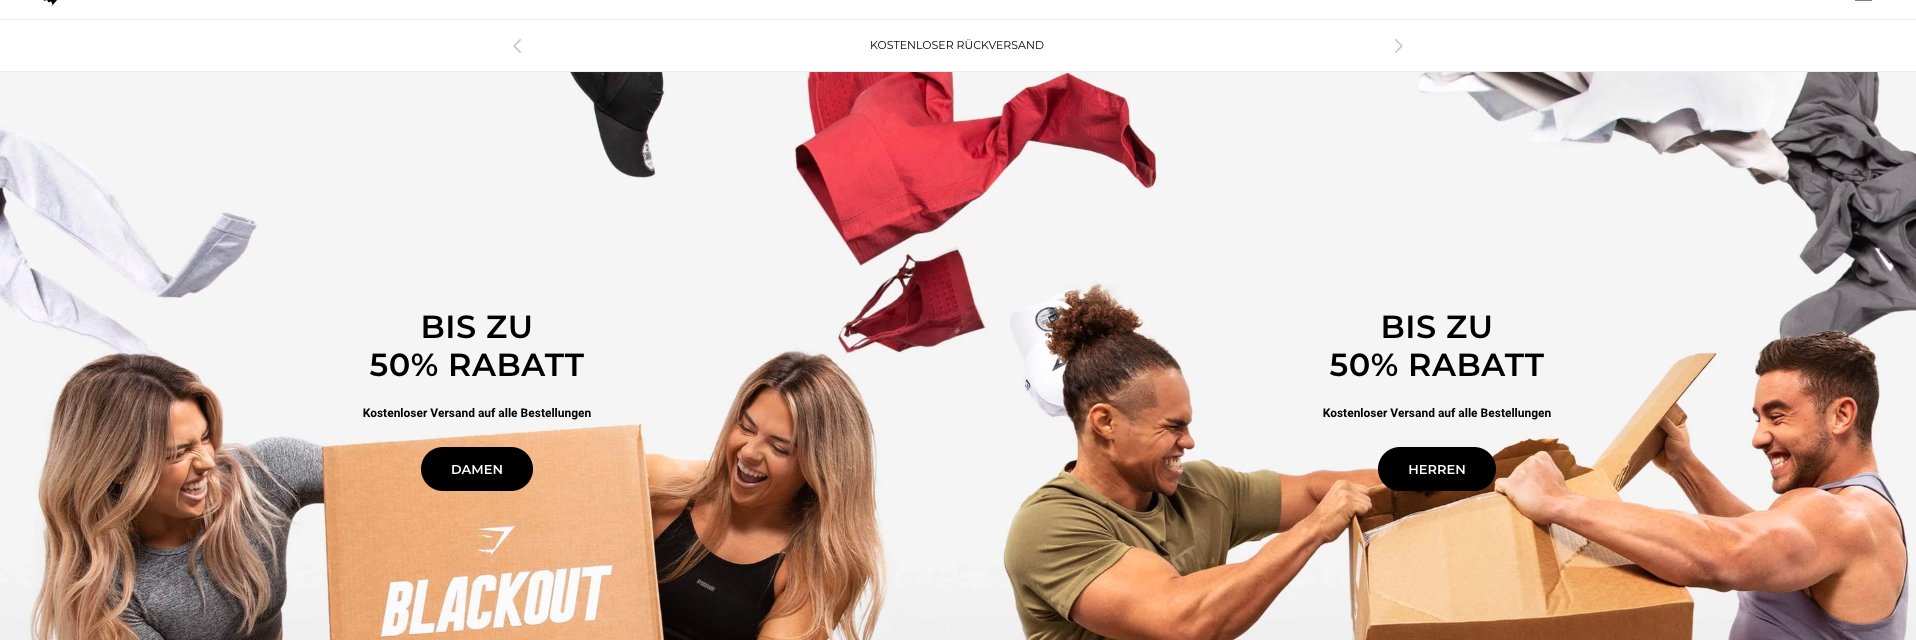 An image showing Gymshark's DE (Germay) homepage